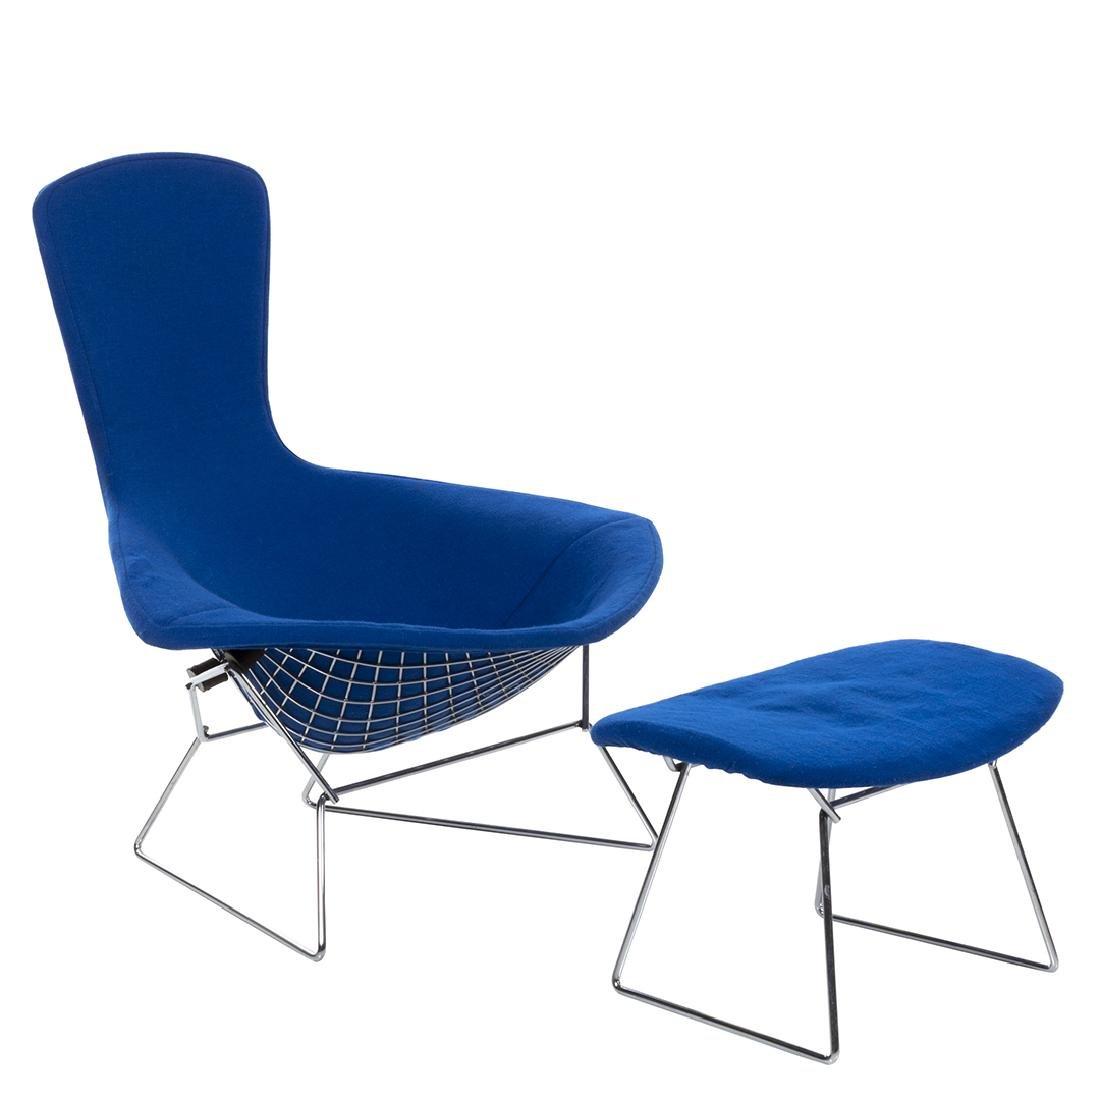 Bertoia Bird Chair and Ottoman